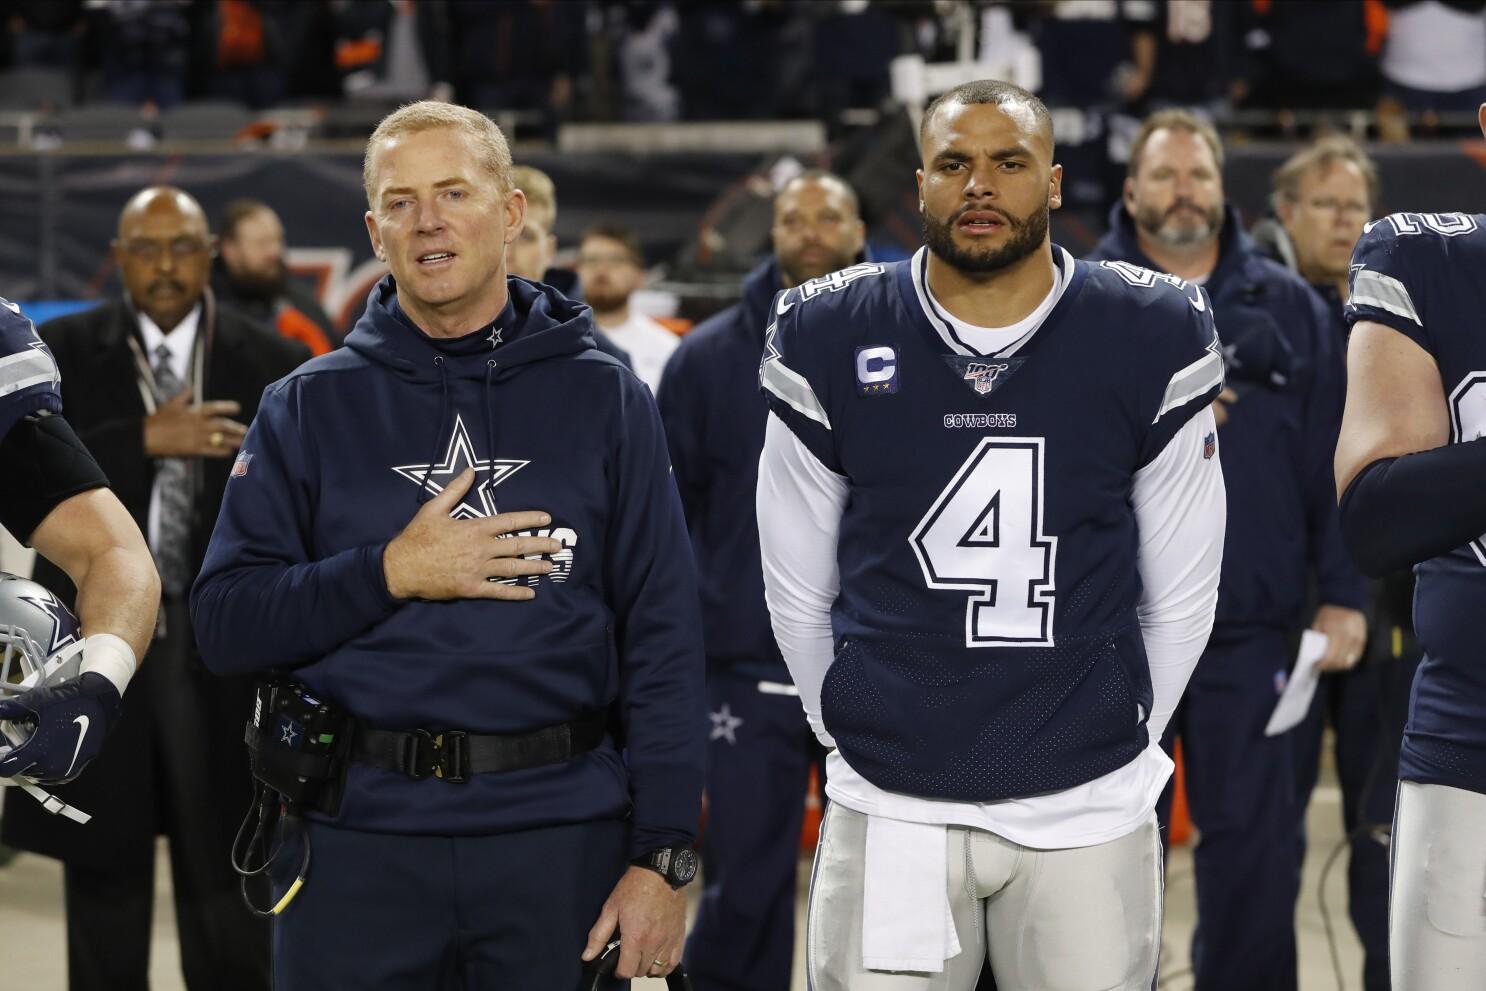 Cowboys Players Ponder Kneeling During National Anthem The San Diego Union Tribune